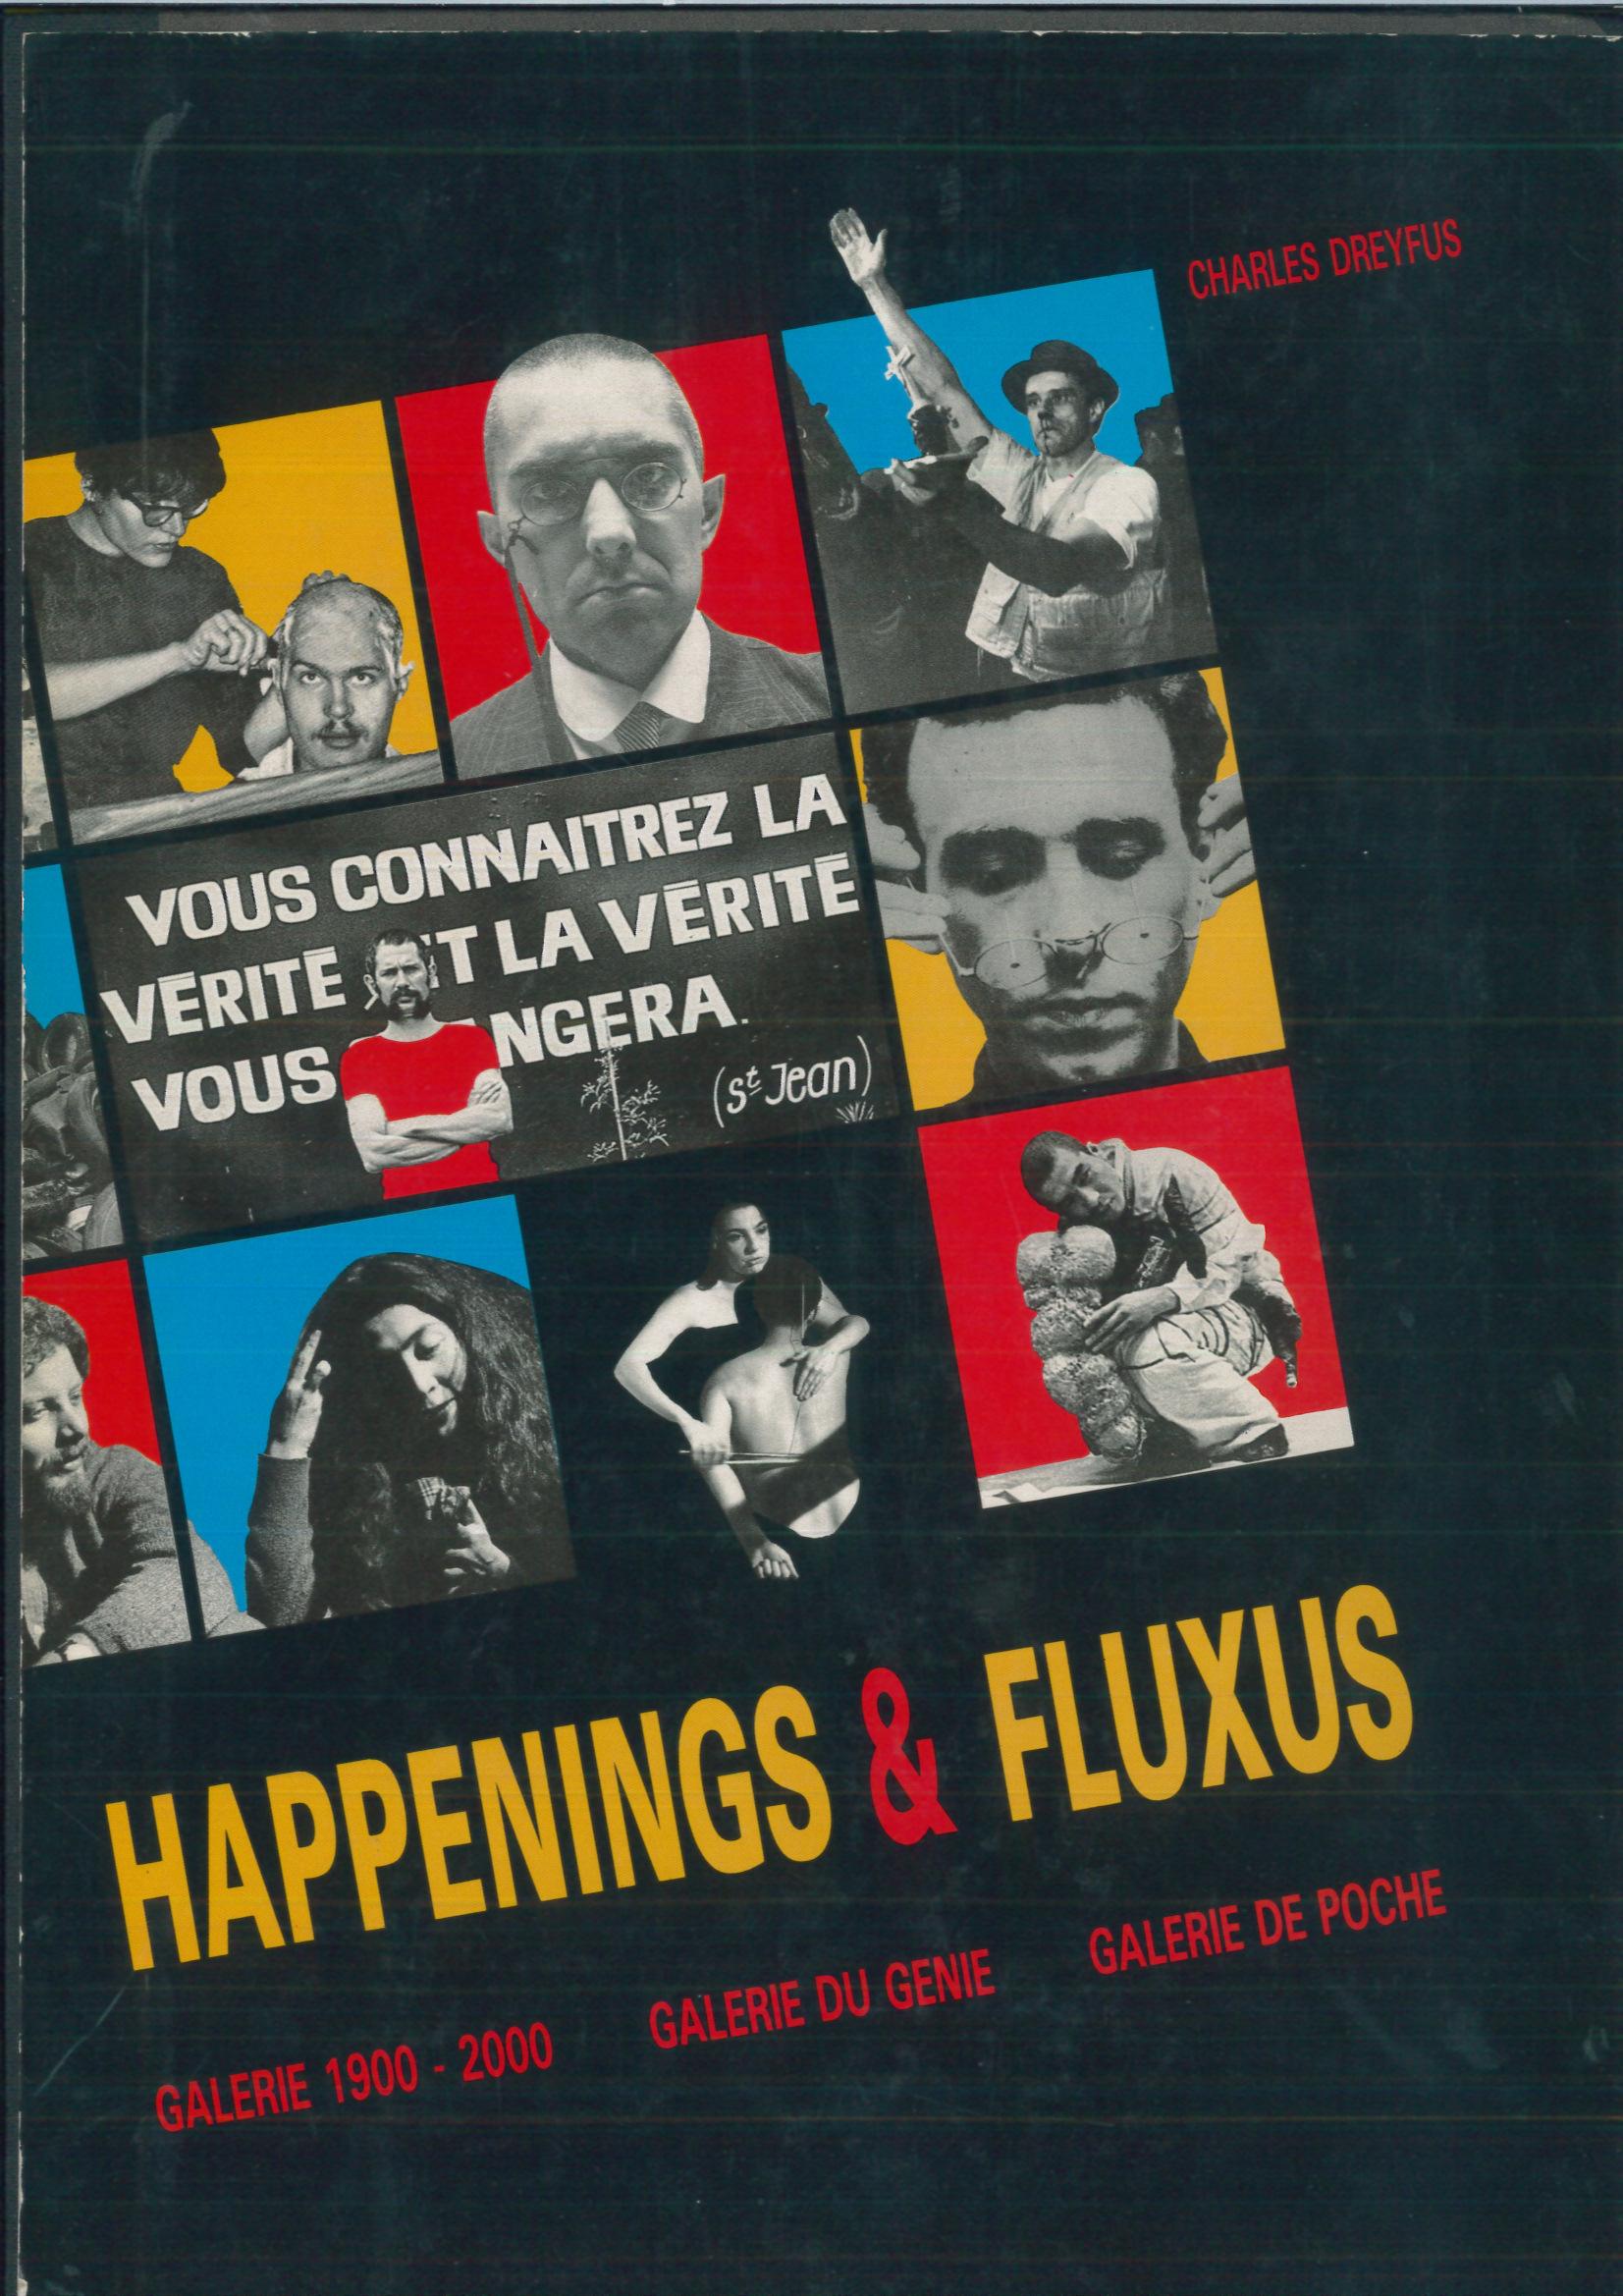 13-7-Happenings-Fluxus-Paris-Galerie-1900-2000-Galerie-du-genie-1989